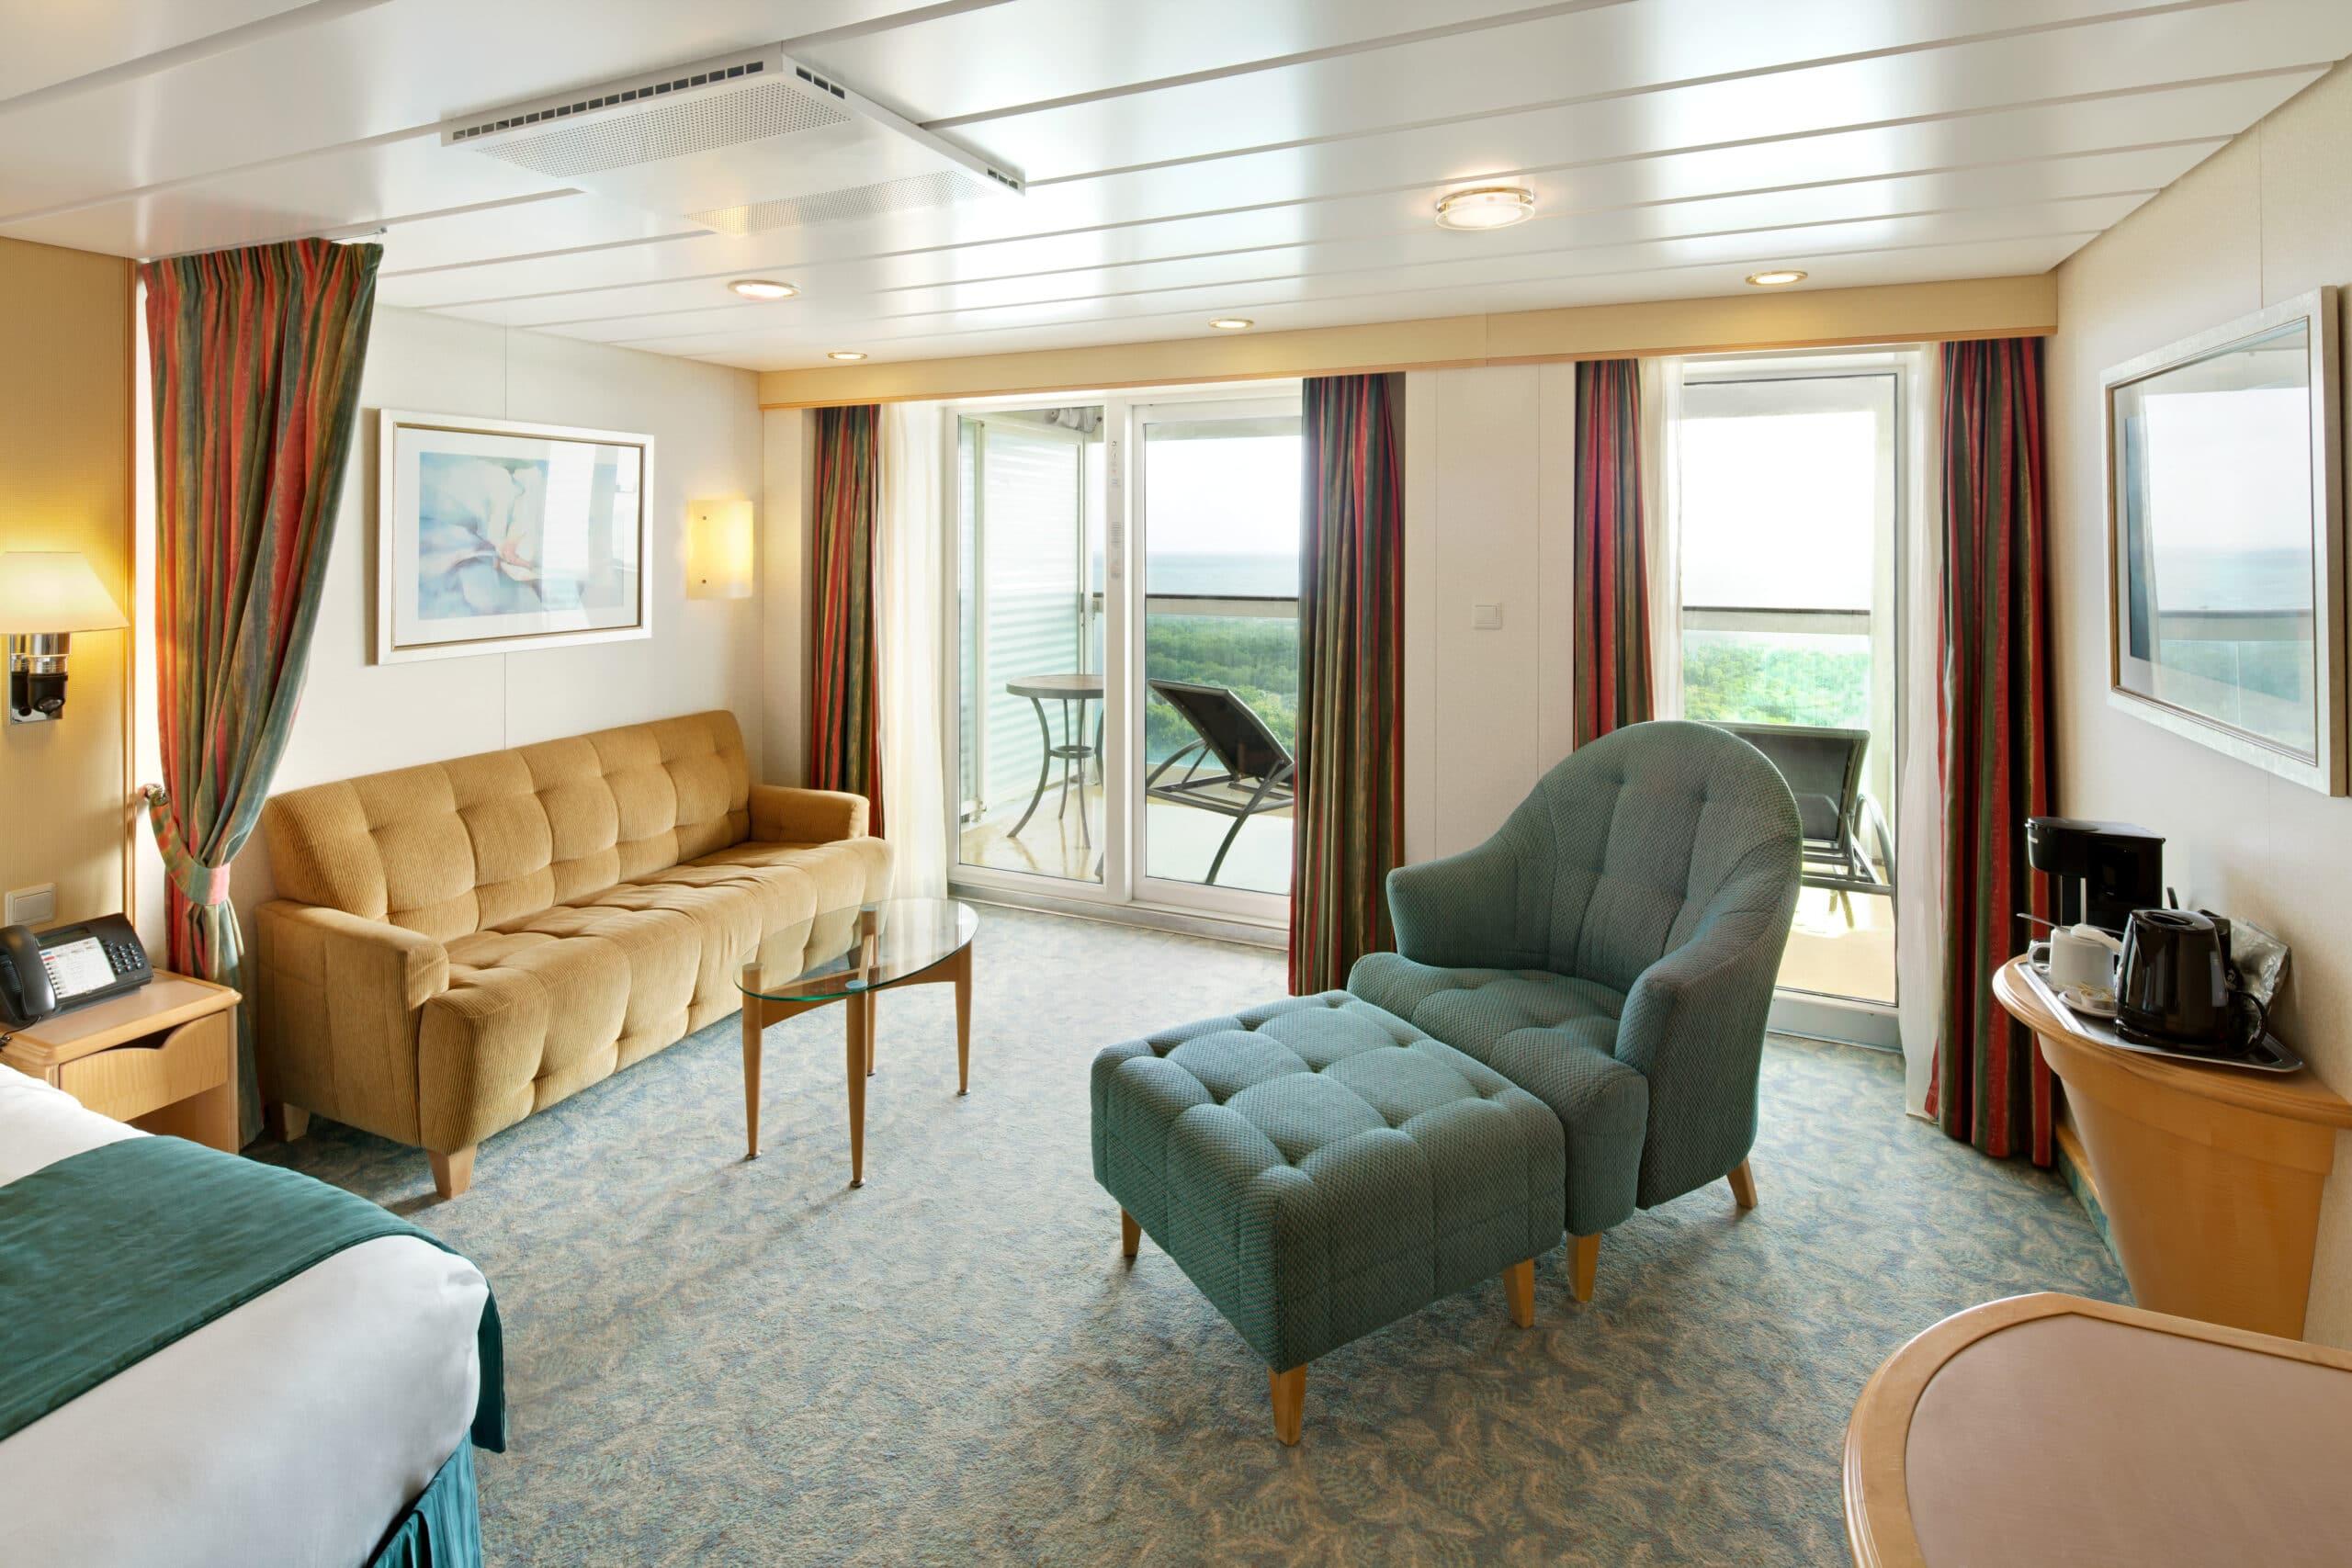 Royal-Caribbean-International-Freedom-of-the-Seas-Liberty-of-the Seas-Independence-of-the-seas-schip-cruiseschip-categorie J3-J4-Junior Suite